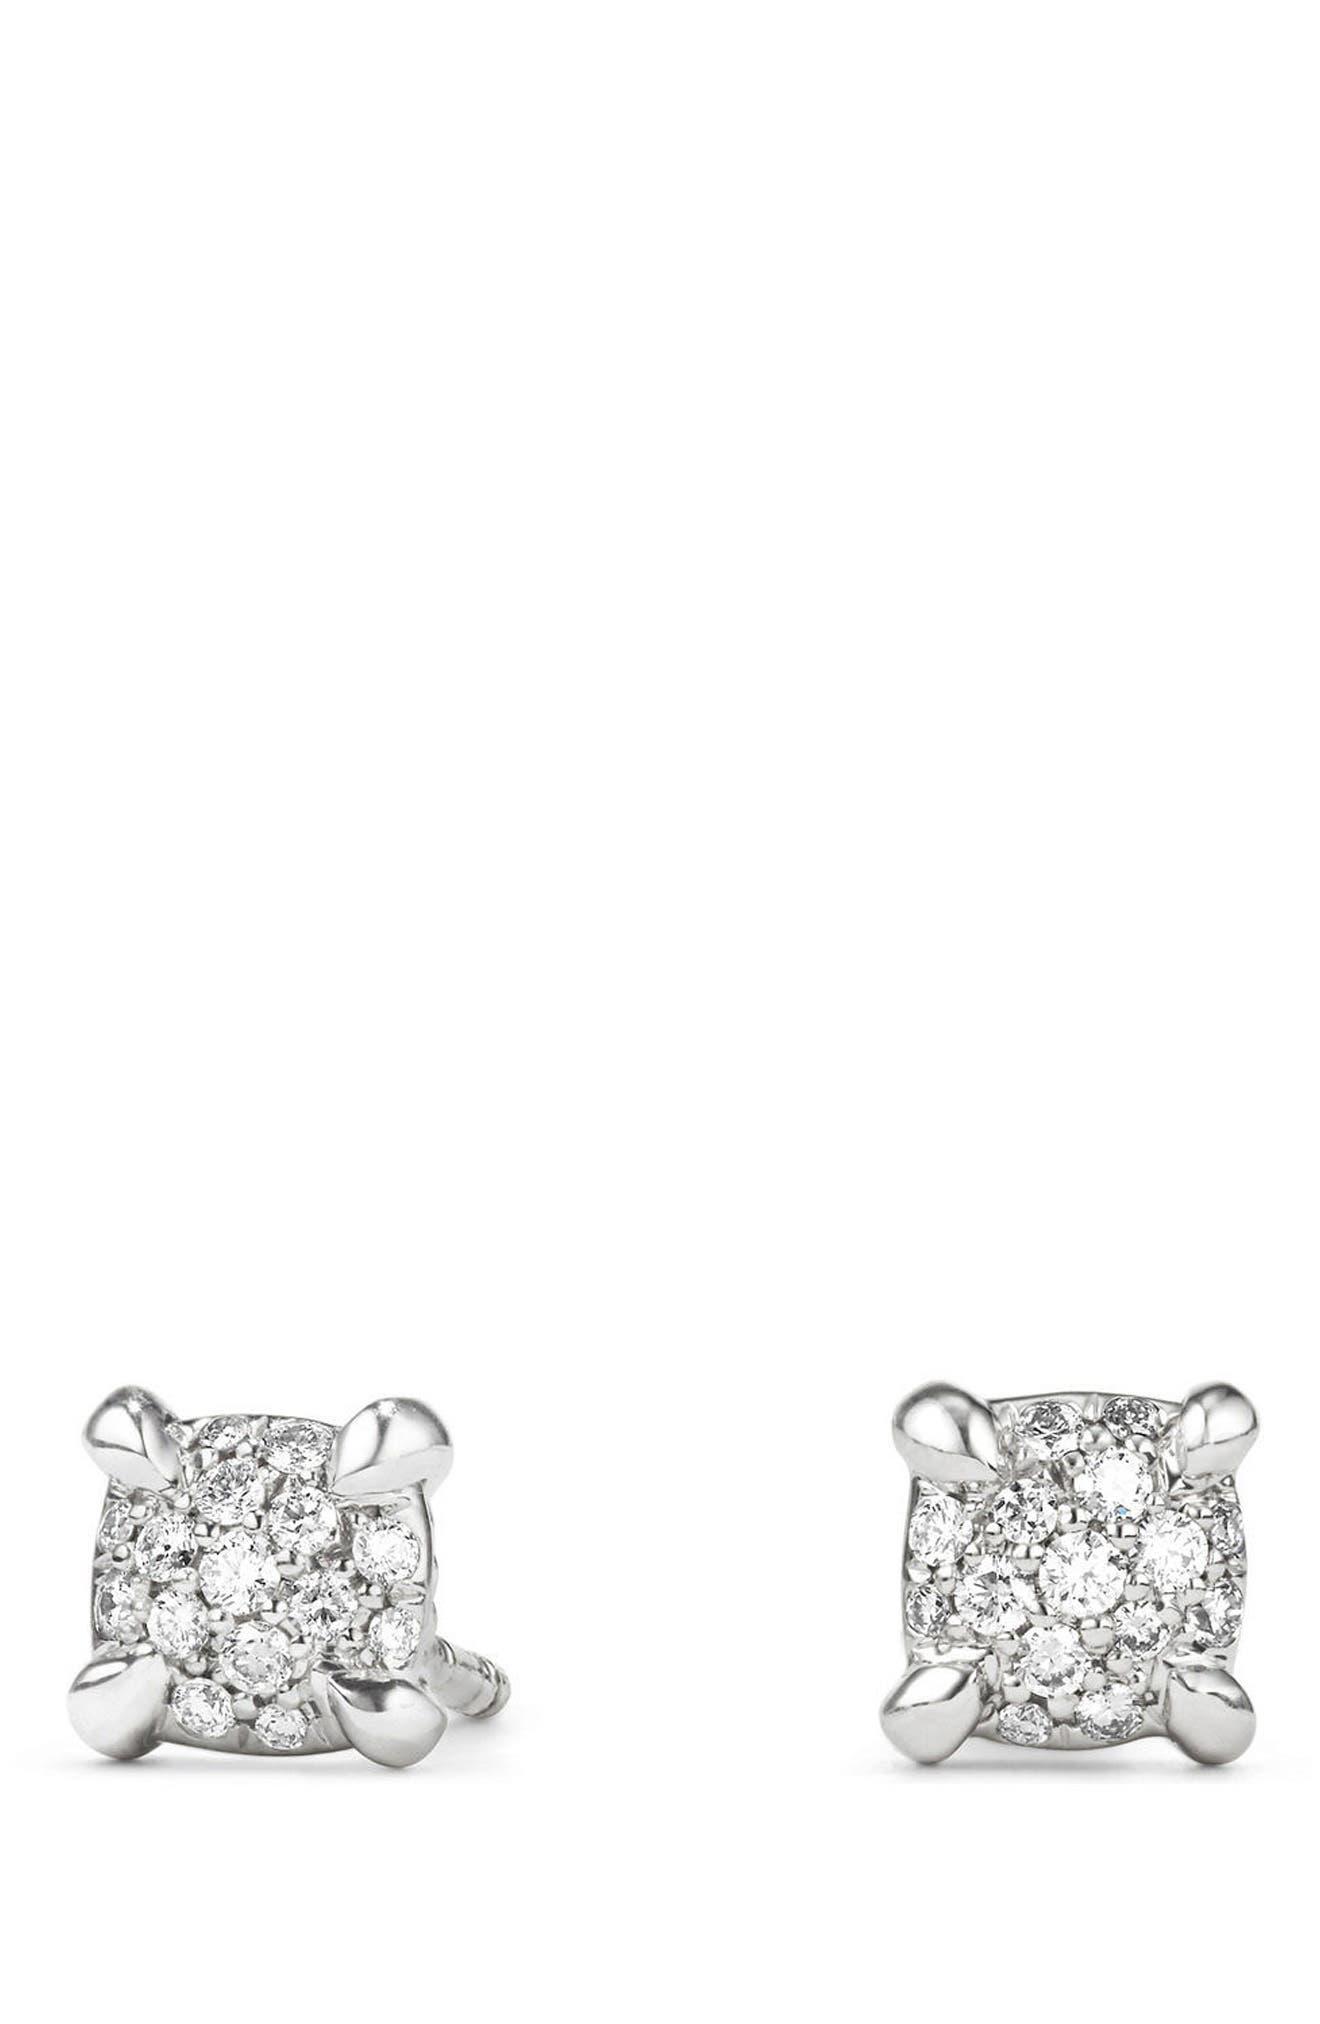 DAVID YURMAN, Châtelaine Stud Earrings with Diamonds, Main thumbnail 1, color, WHITE GOLD/ DIAMOND